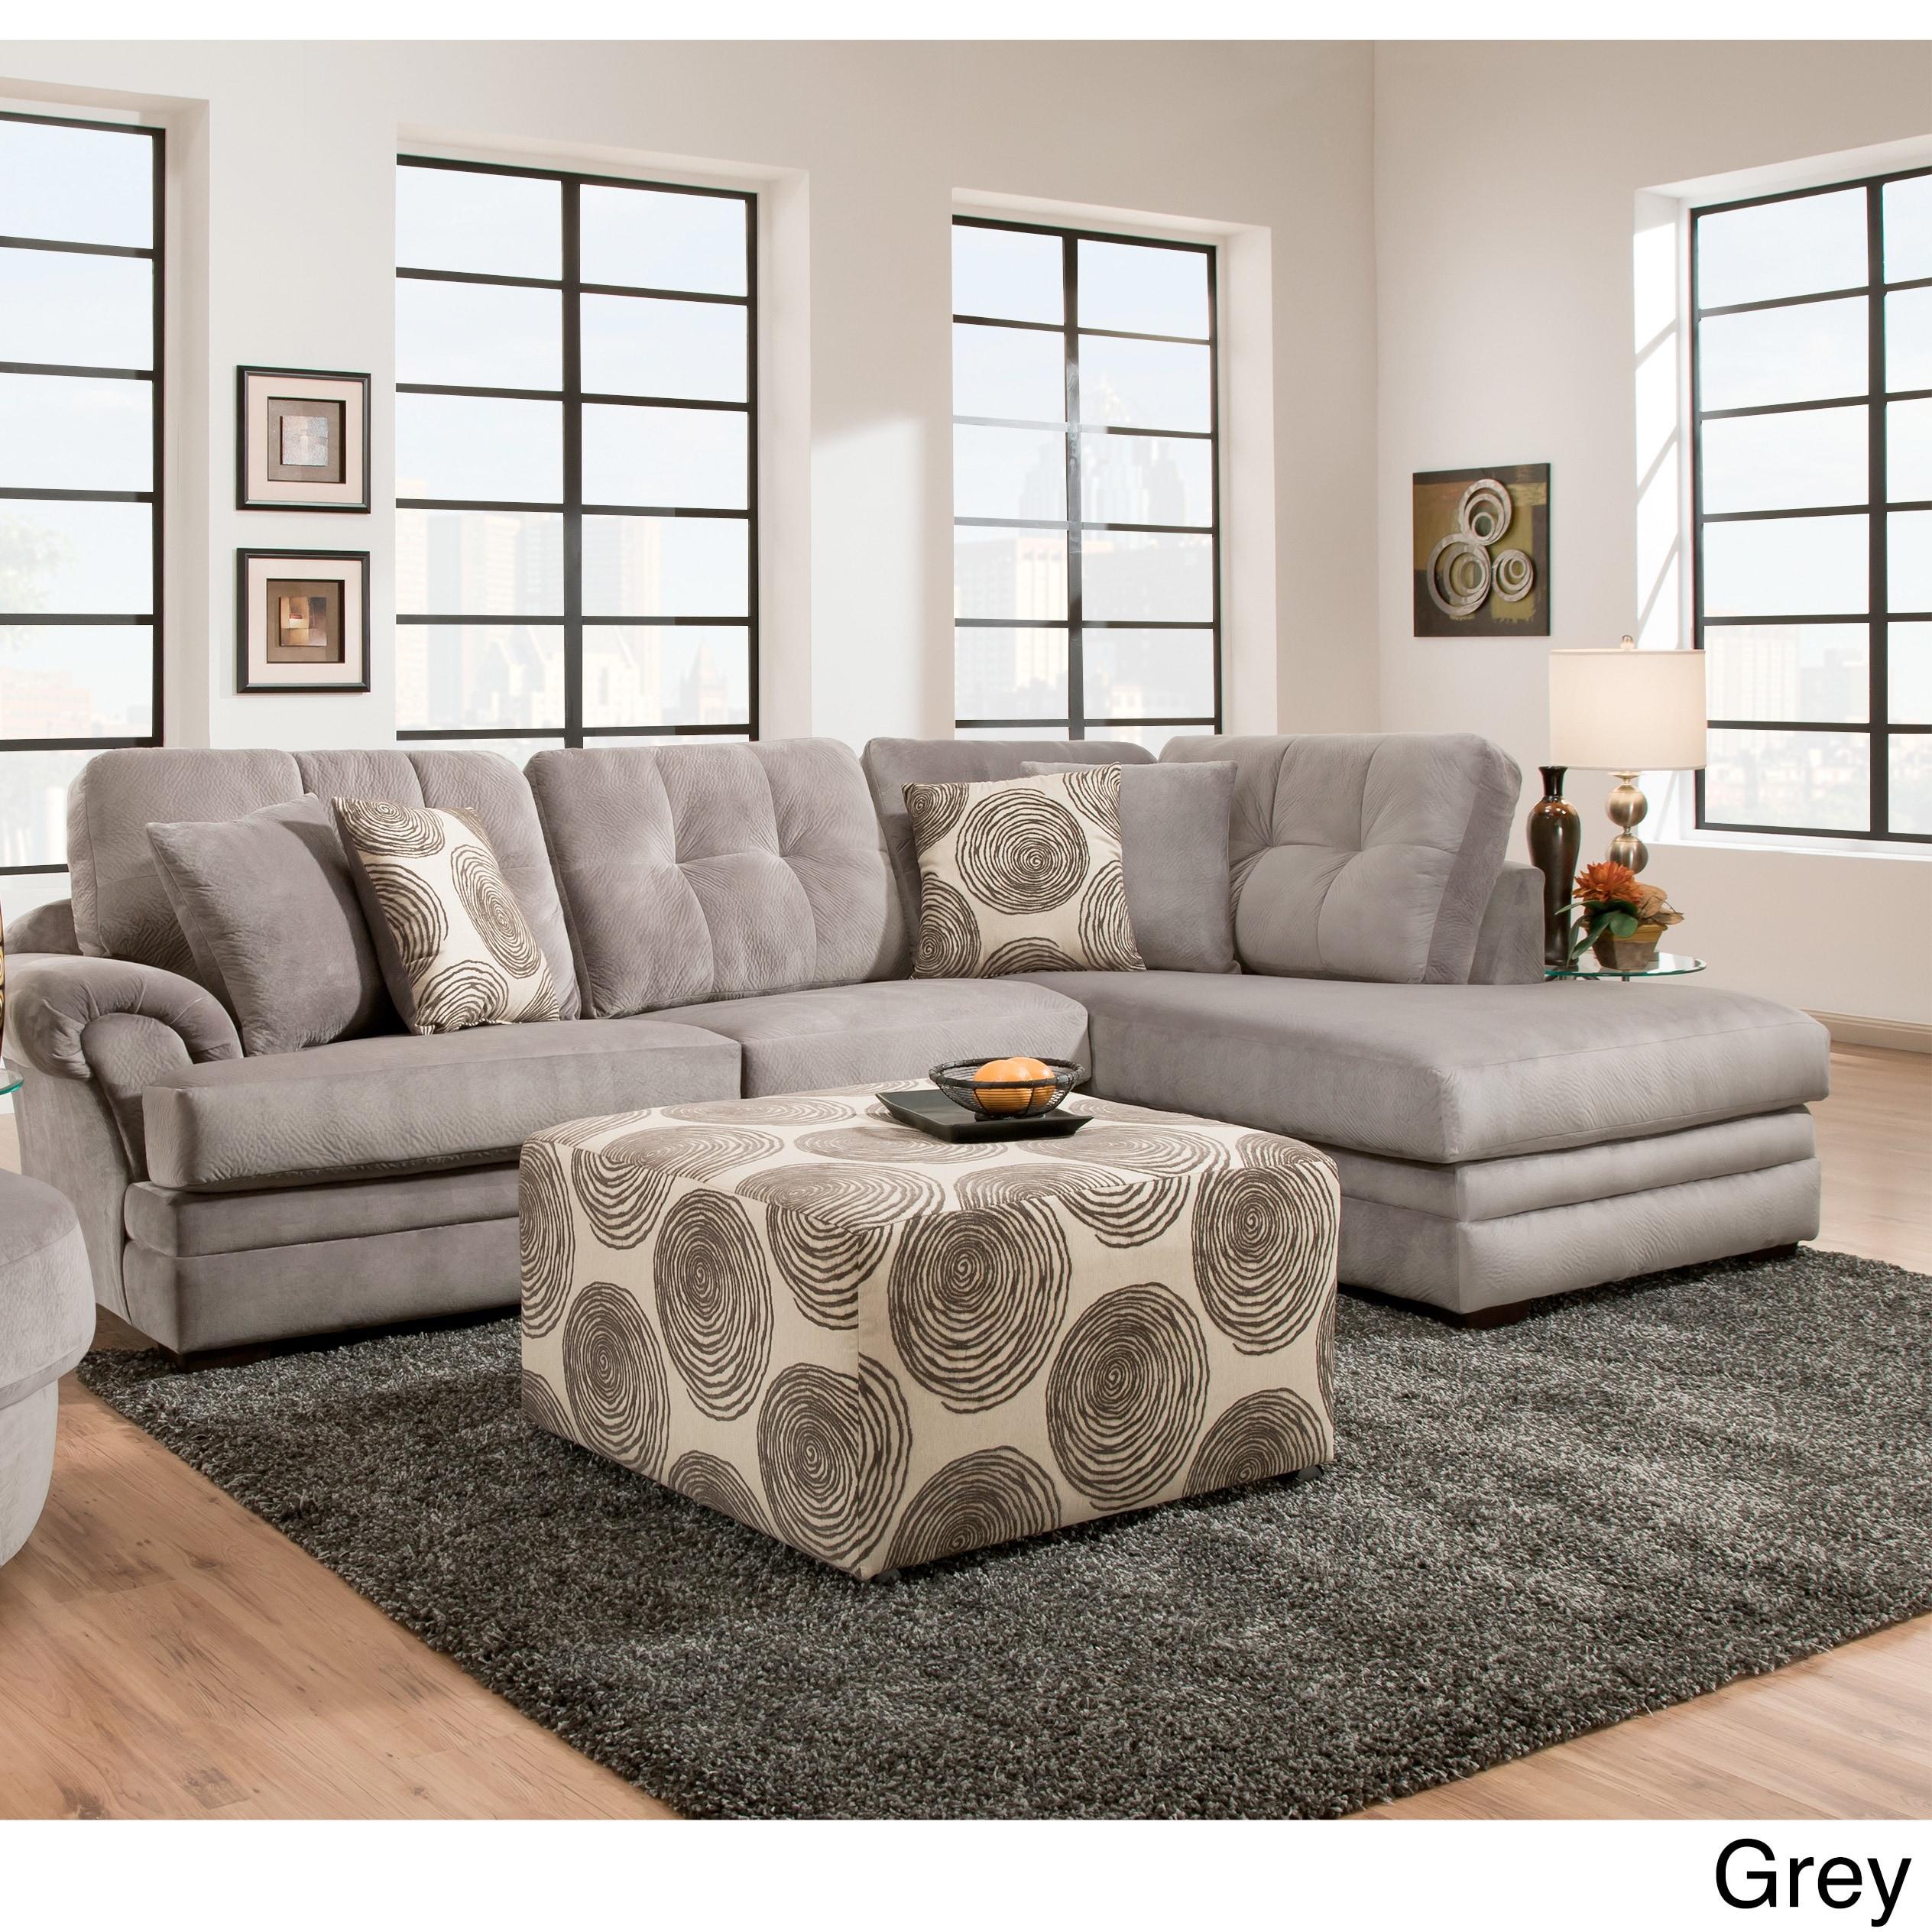 Sofa Trendz Plush Grey and Brown Velvet Sectional (Grey) ...